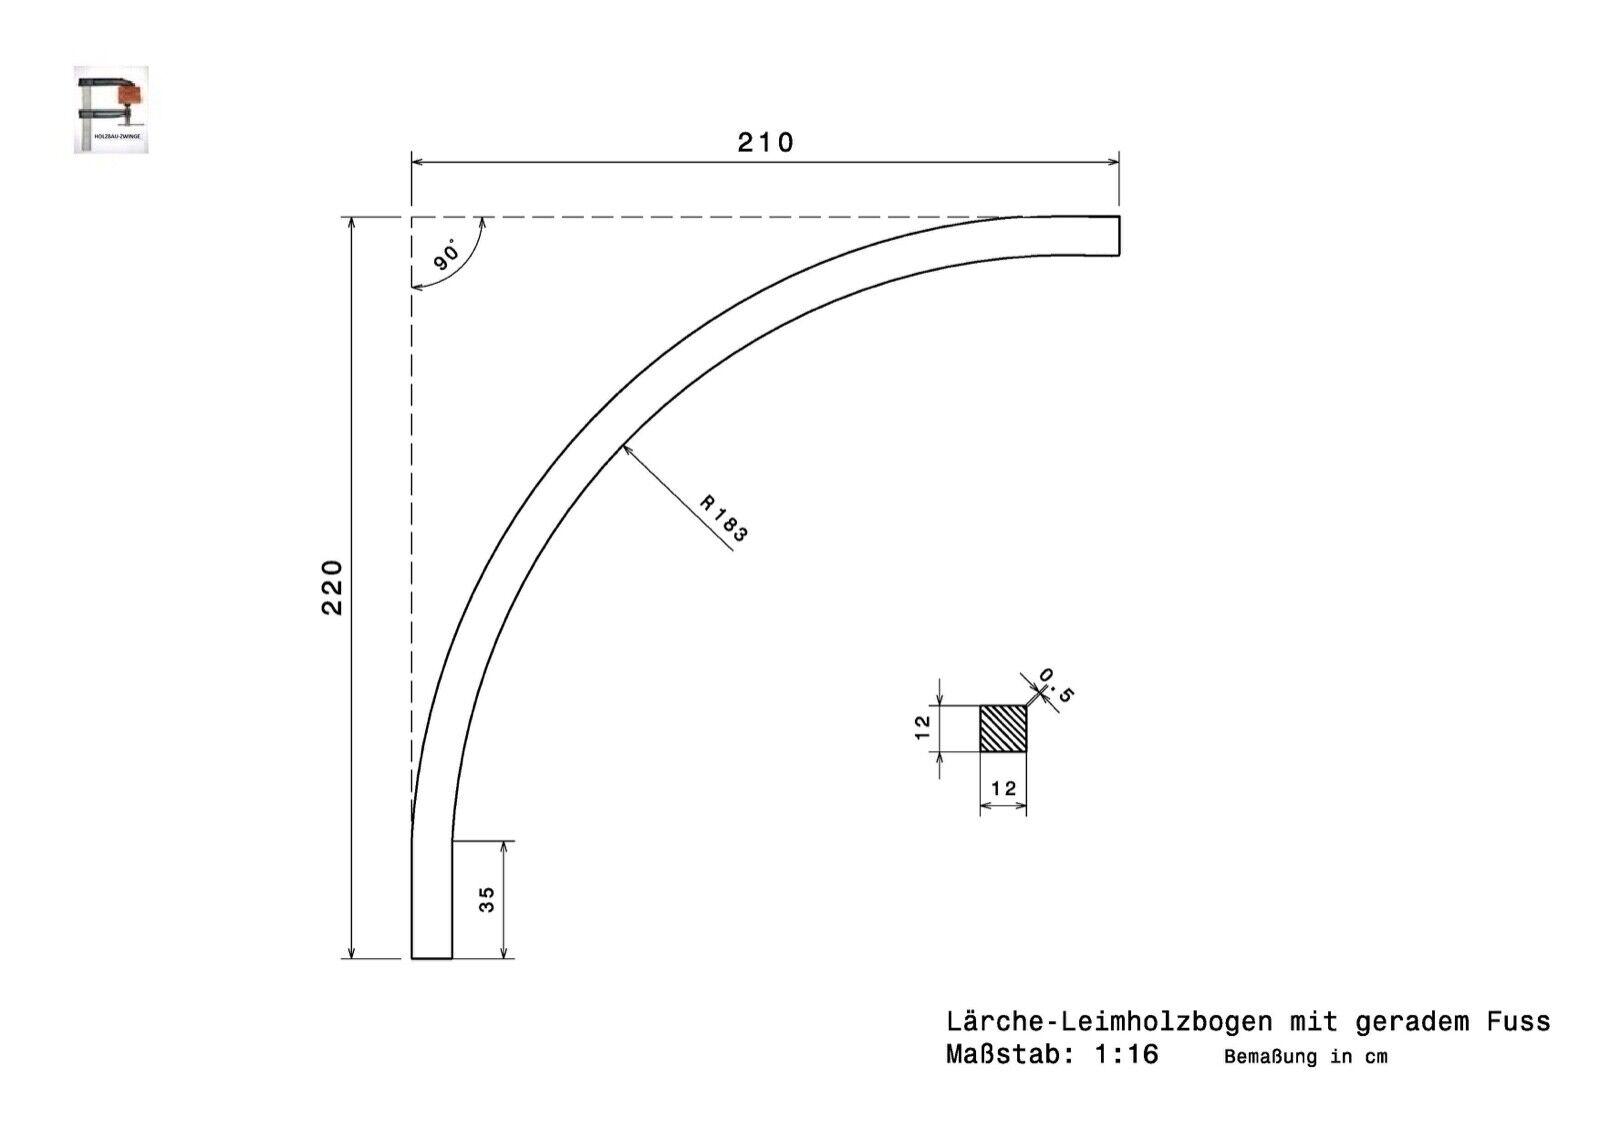 Massiv-Breit Lärche12x12 Leimholzbogen Leimbogen Rundbogen Holzbogen Carport